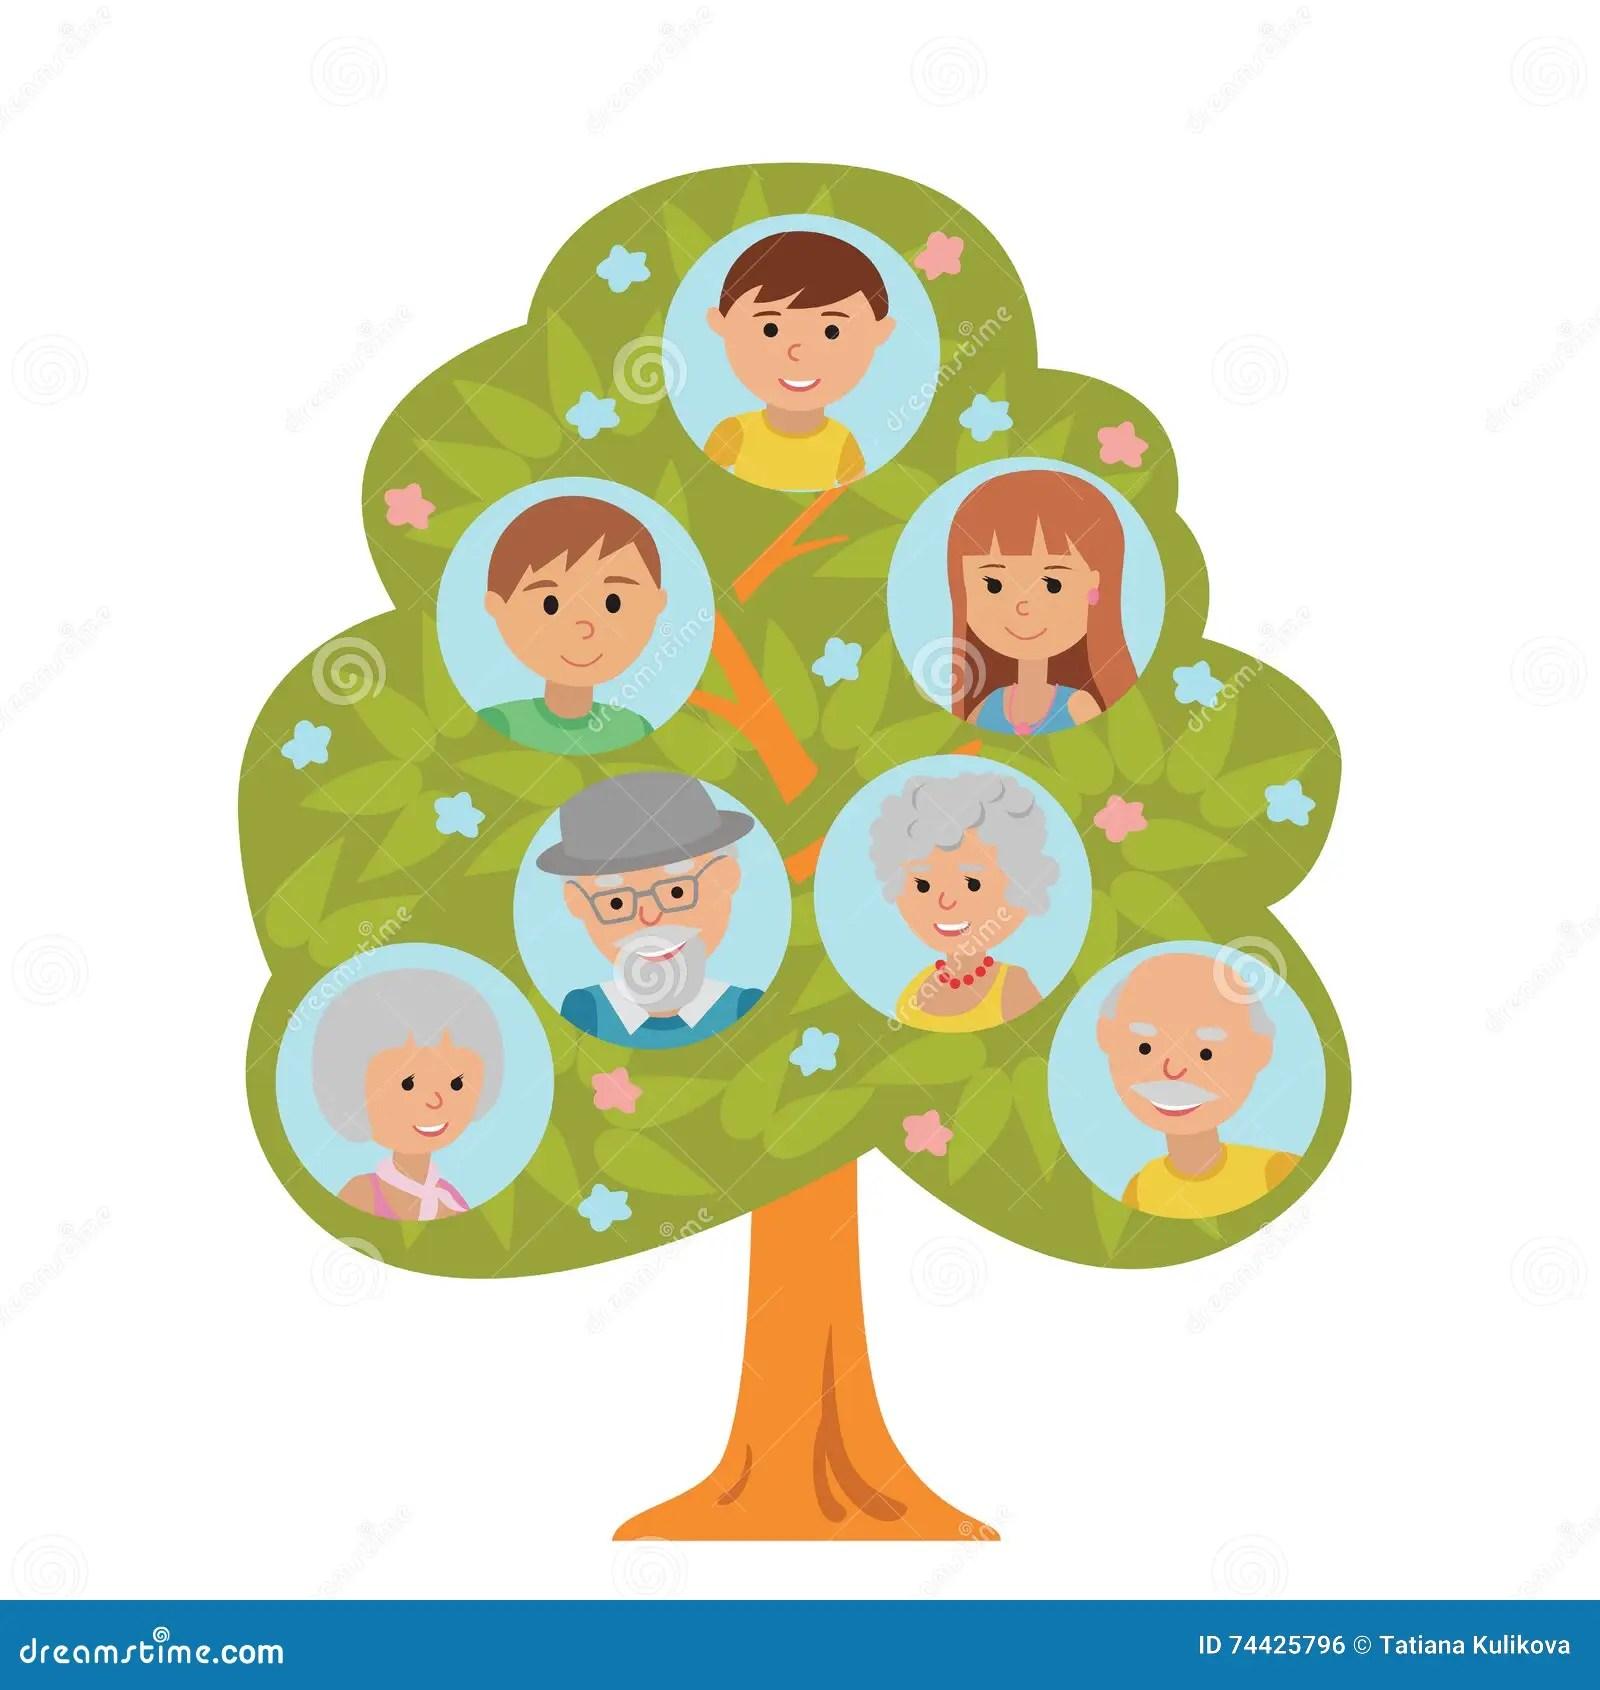 Cartoon Generation Family Tree In Flat Style Grandparents